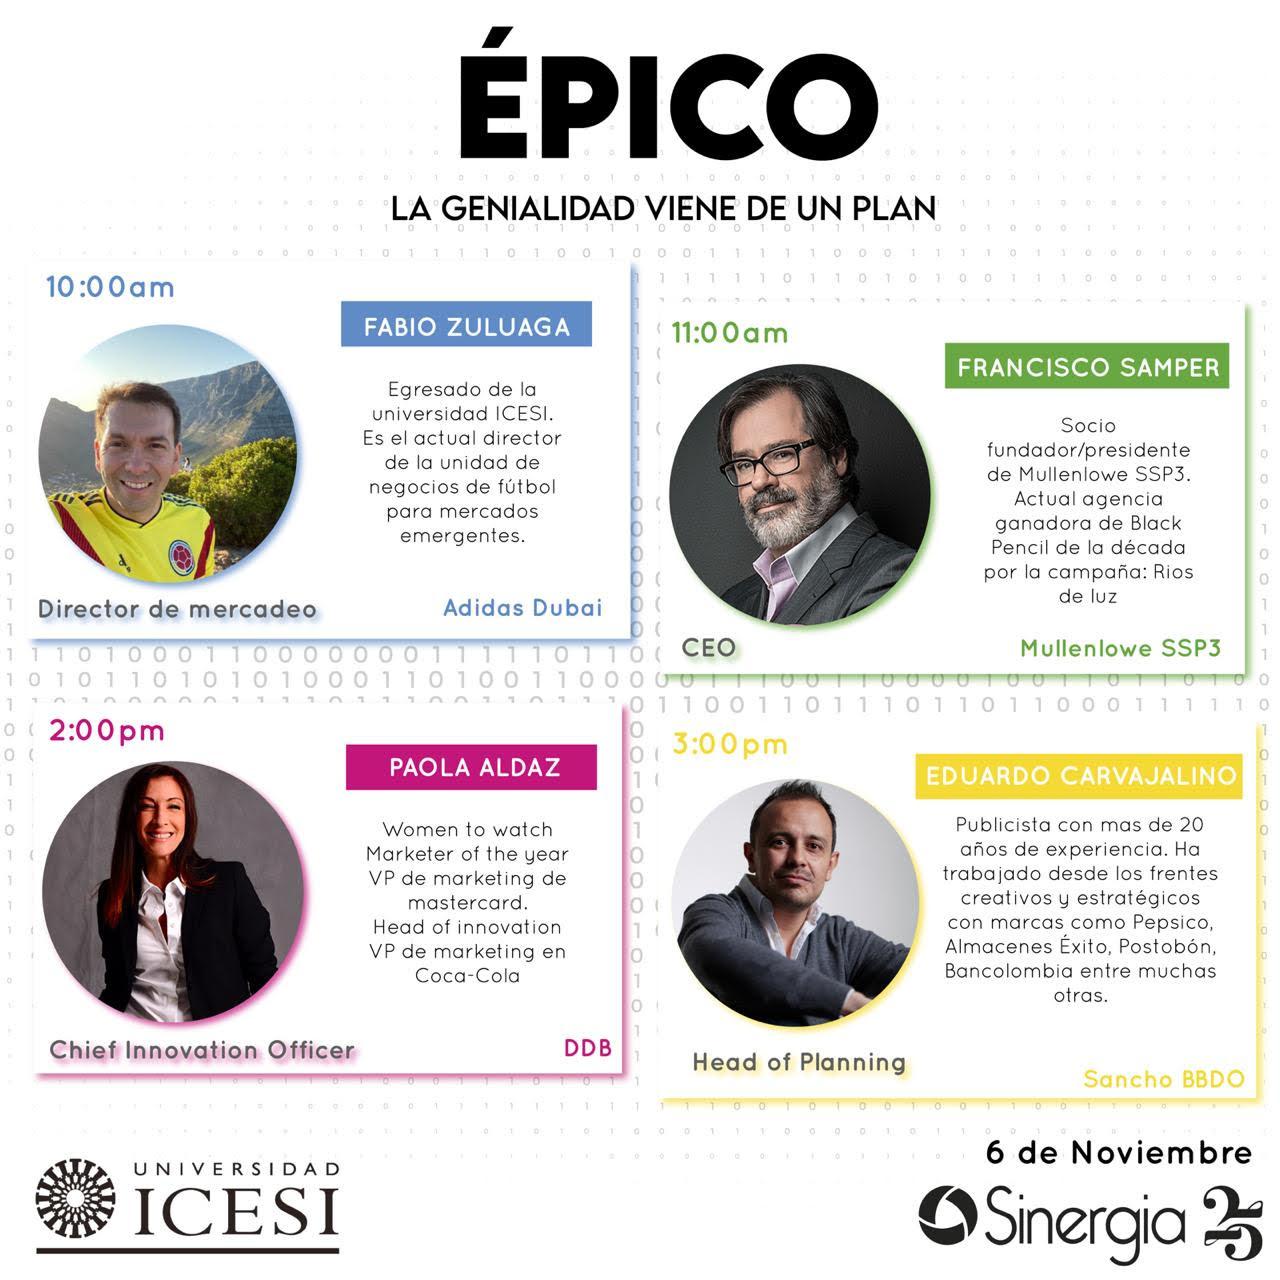 SINERGIA 25 ÉPICO (online)